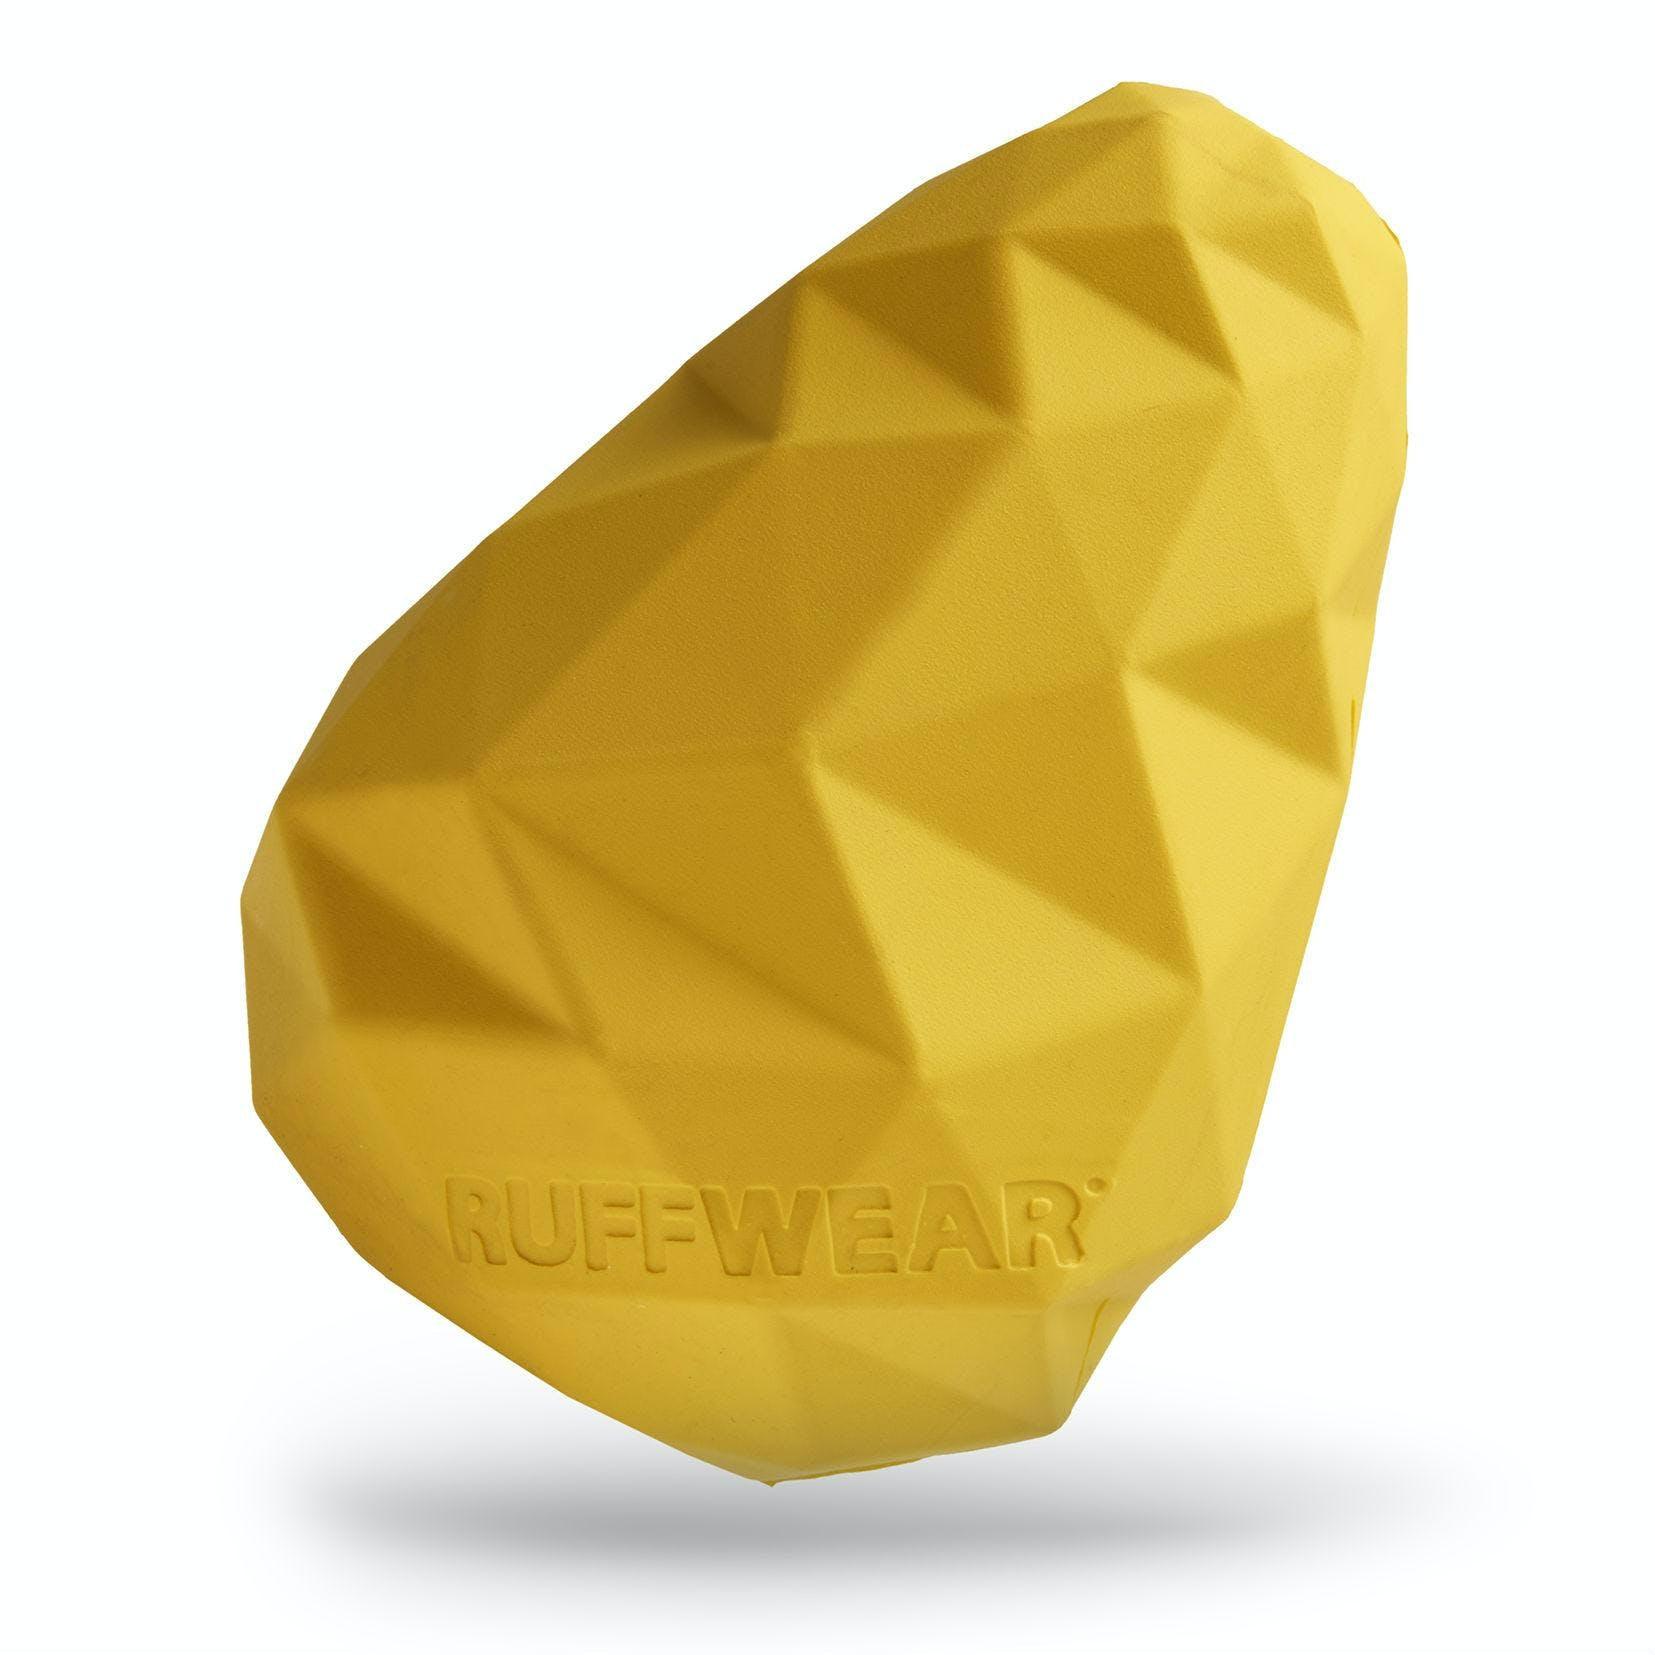 RUFFWEAR - GNAWT-A-CONE - Dandelion Yellow